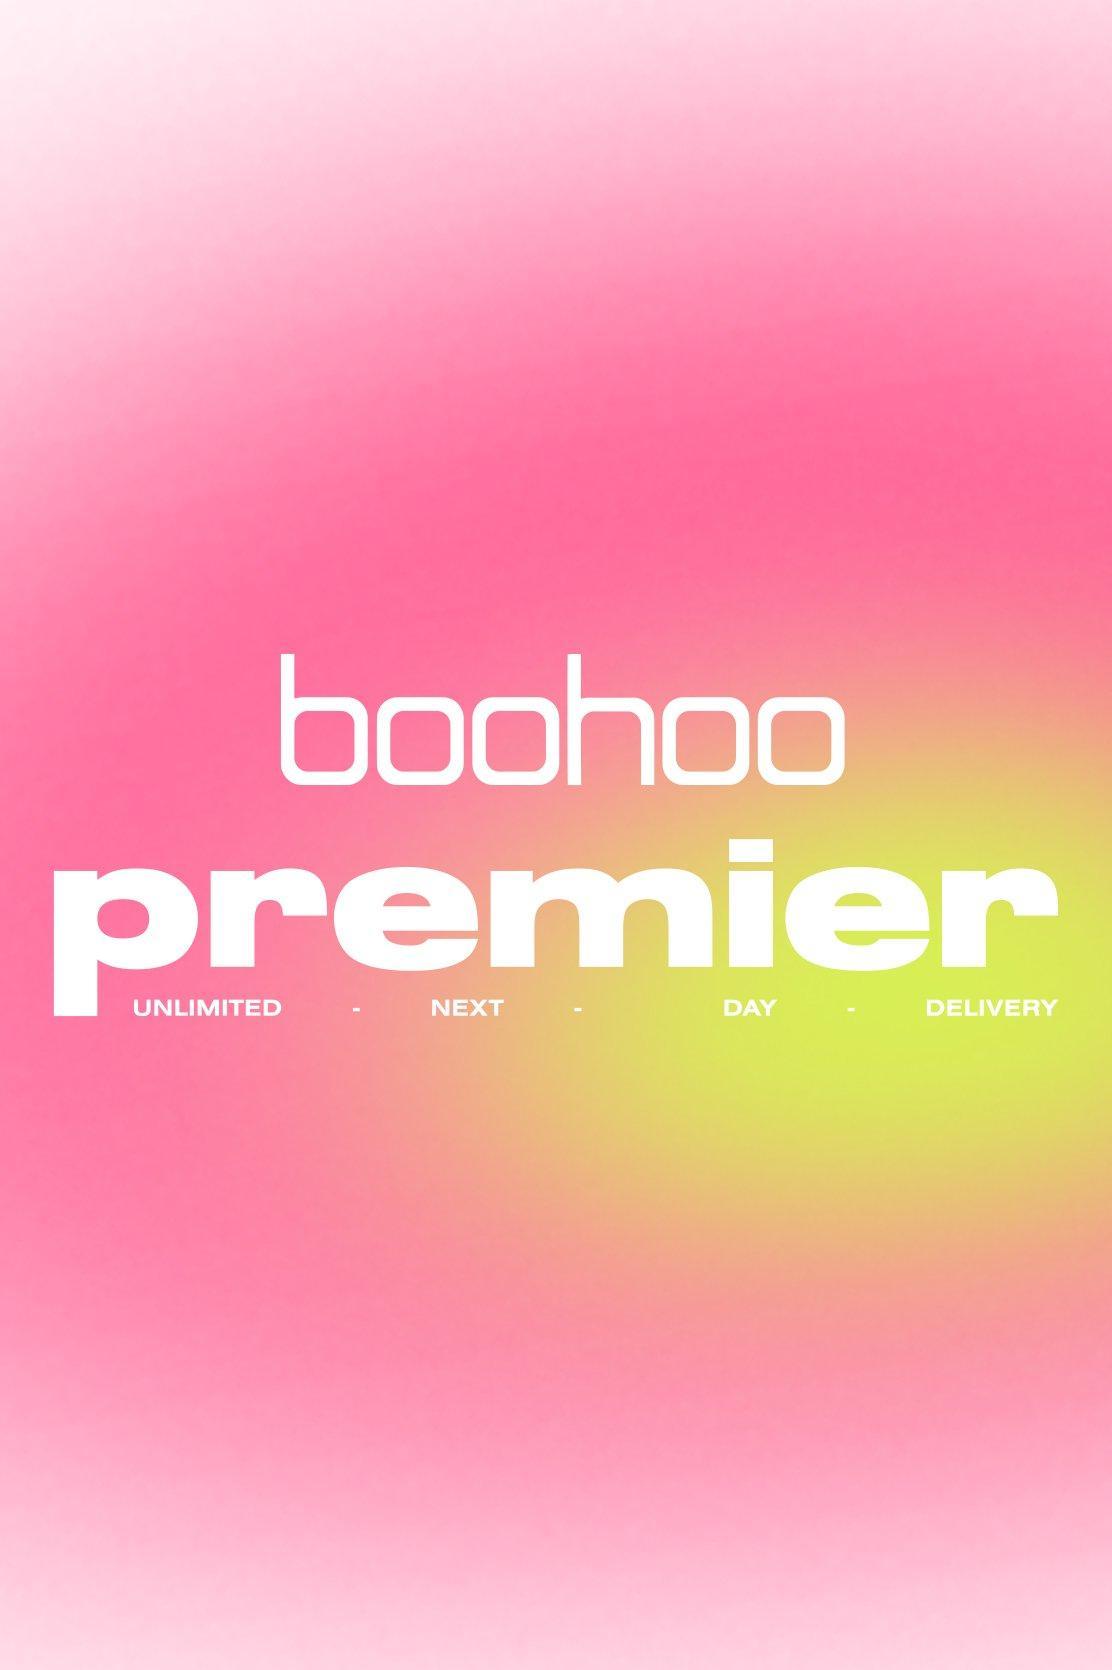 boohoo-global-navigation-UK BOOHOO PREMIER - UNLIMITED NEXT DAY DELIVERY